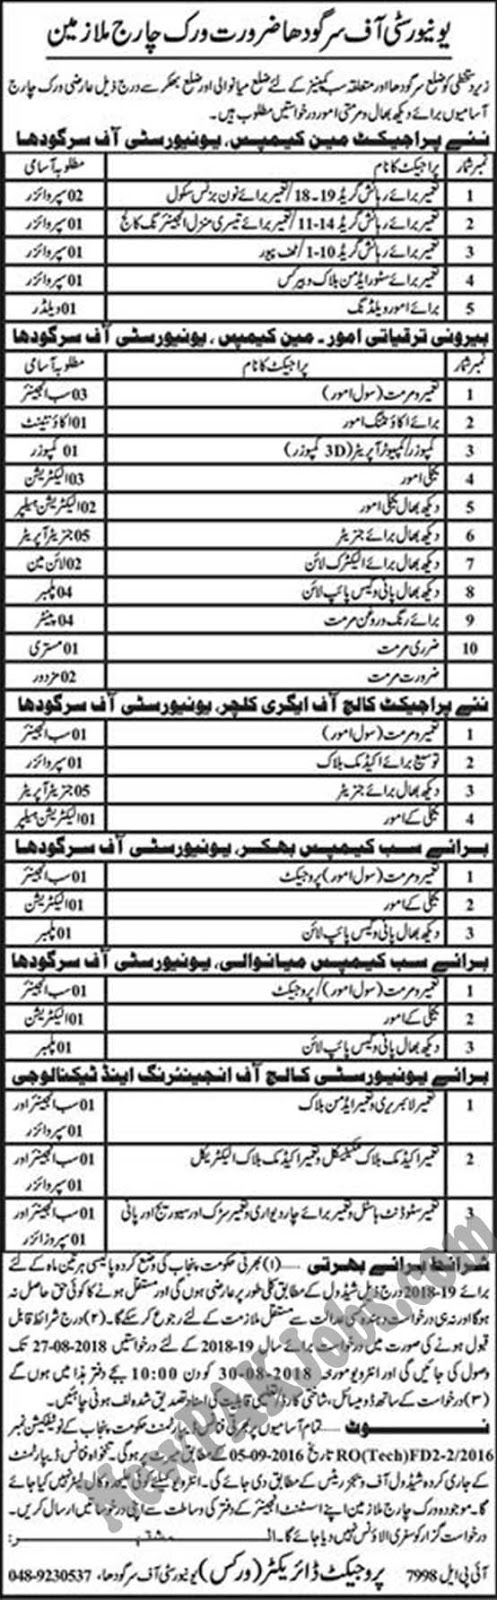 54 Jobs in University of Sargodha August 2018